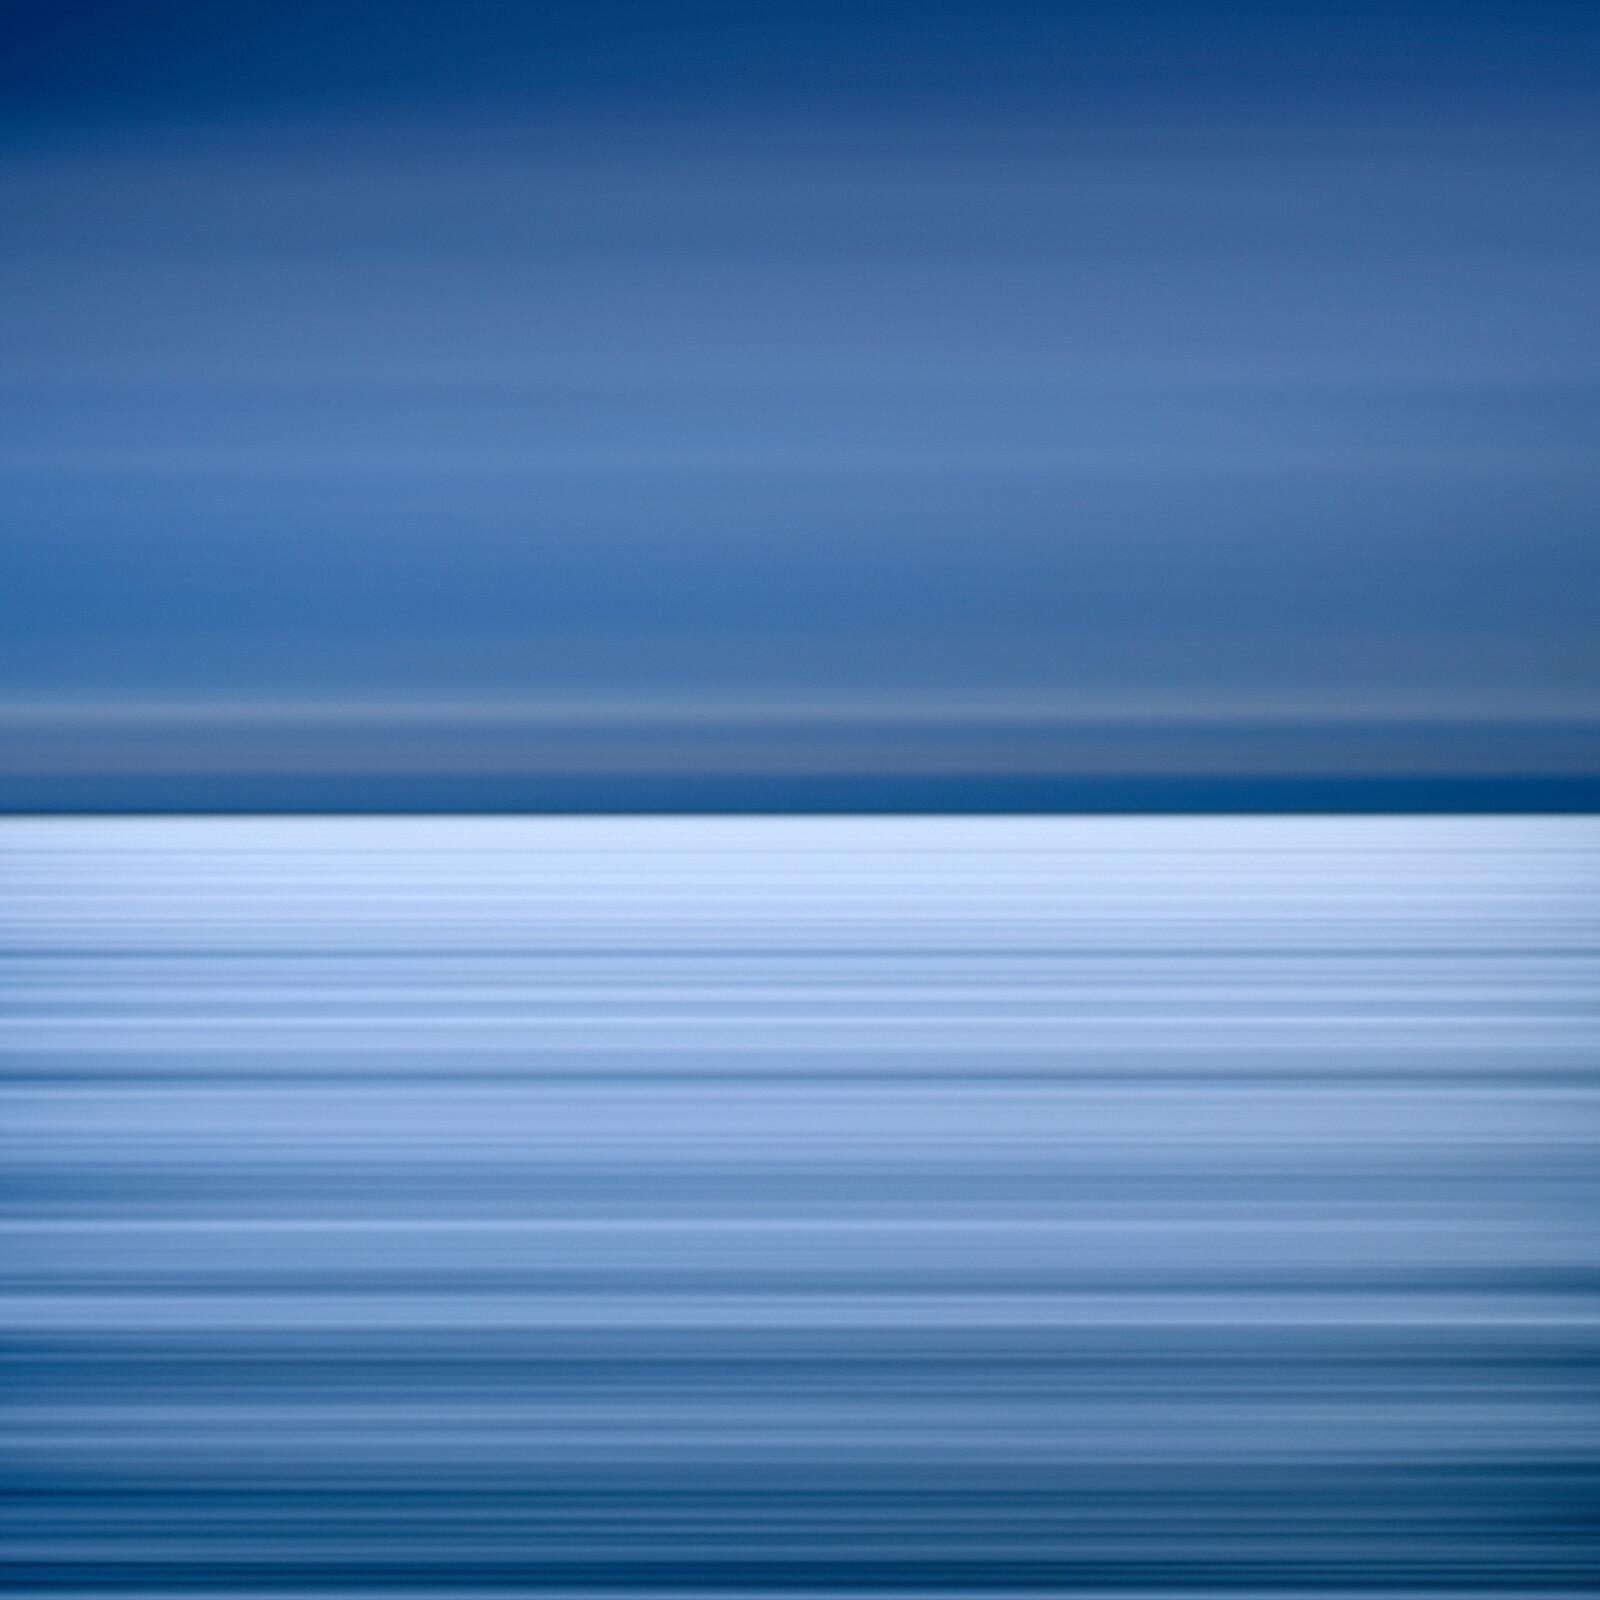 Pacific Ocean Kashima, Japan - David Burdeny